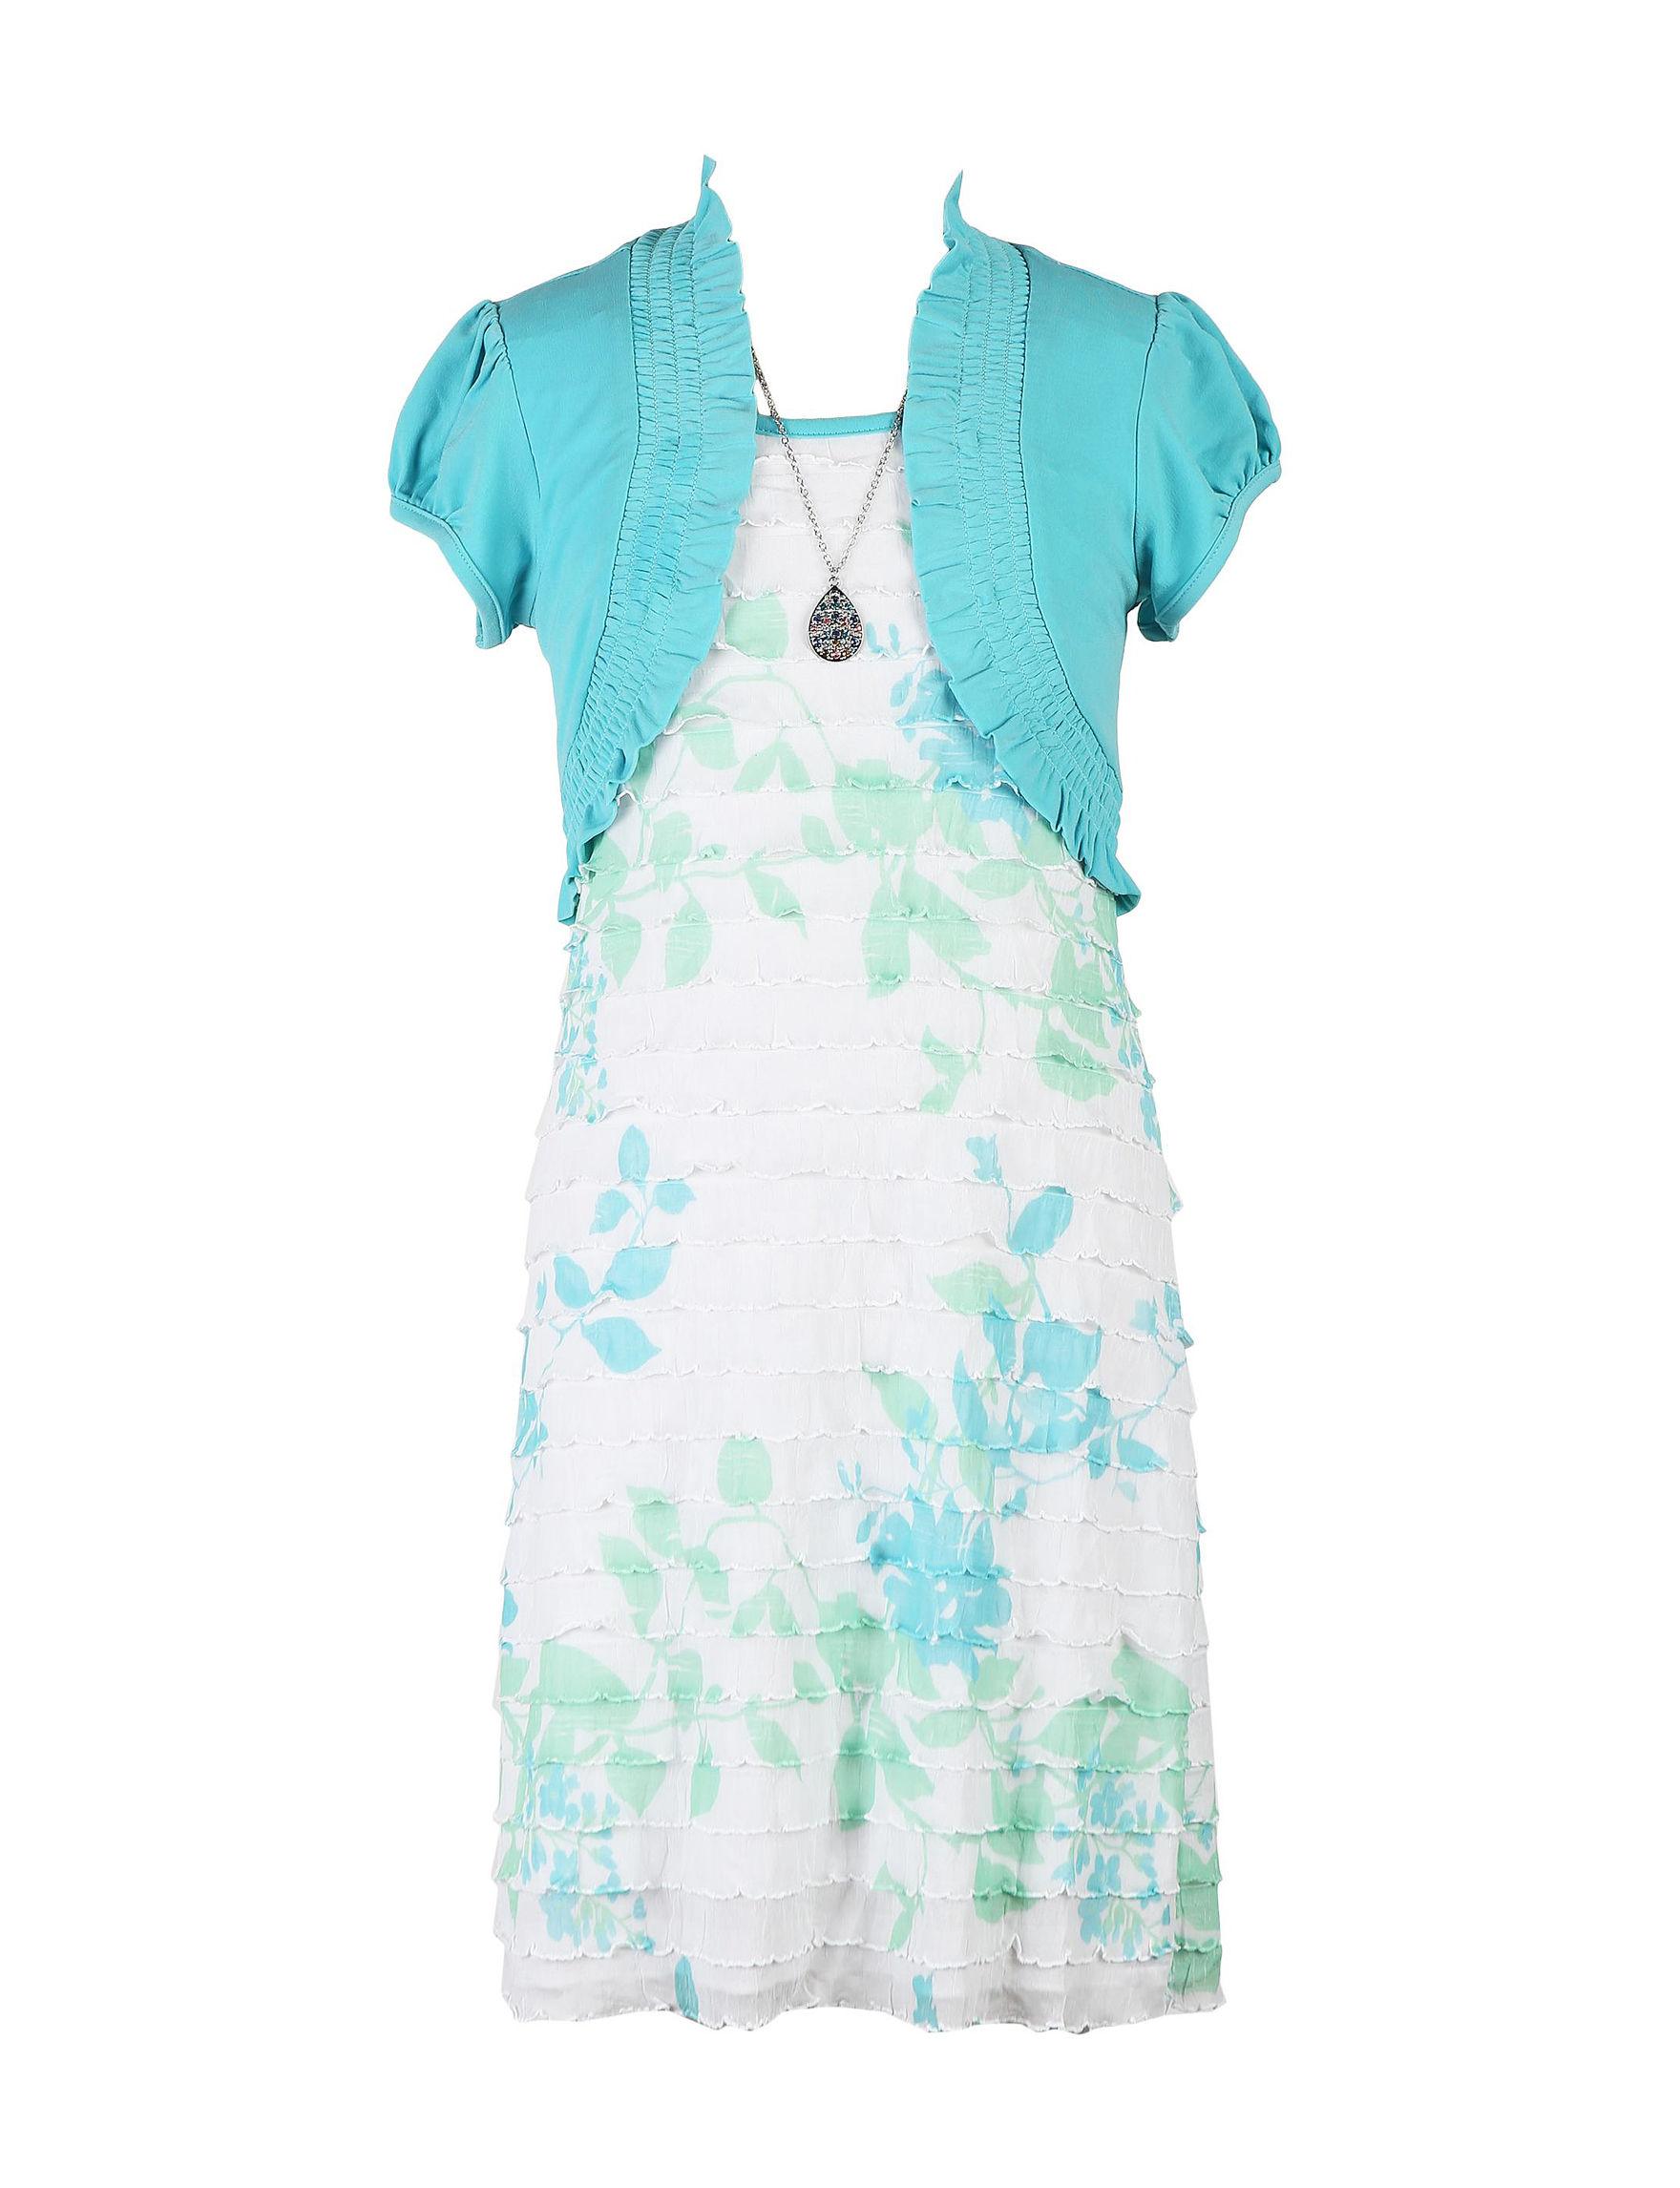 82e792c9a1b5 Speechless 2-pc. Lace Floral Dress   Shrug Set - Girls Plus